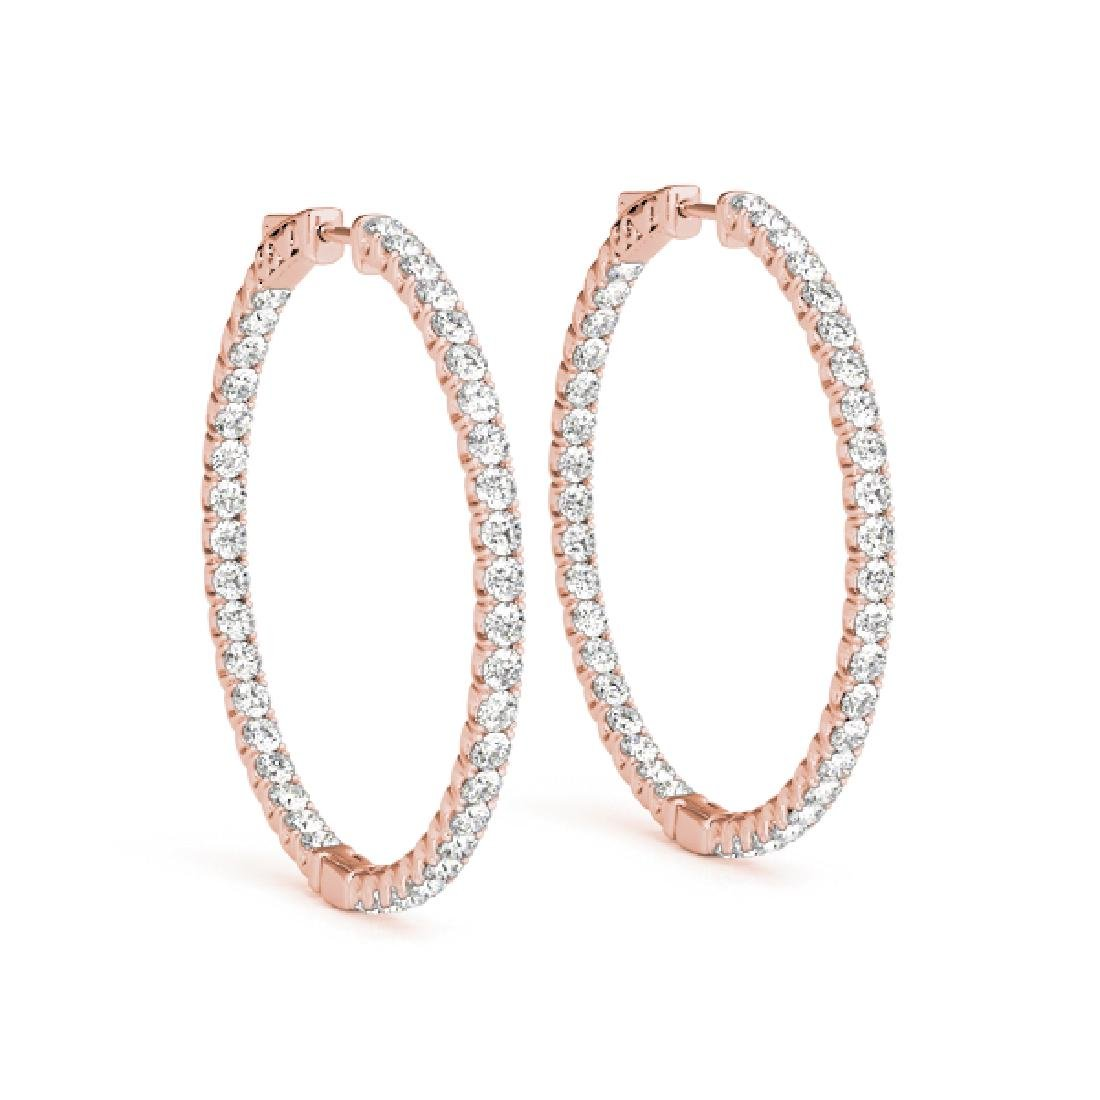 1.5 CTW Diamond VS/SI Certified 24 Mm Hoop Earrings 14K - 2